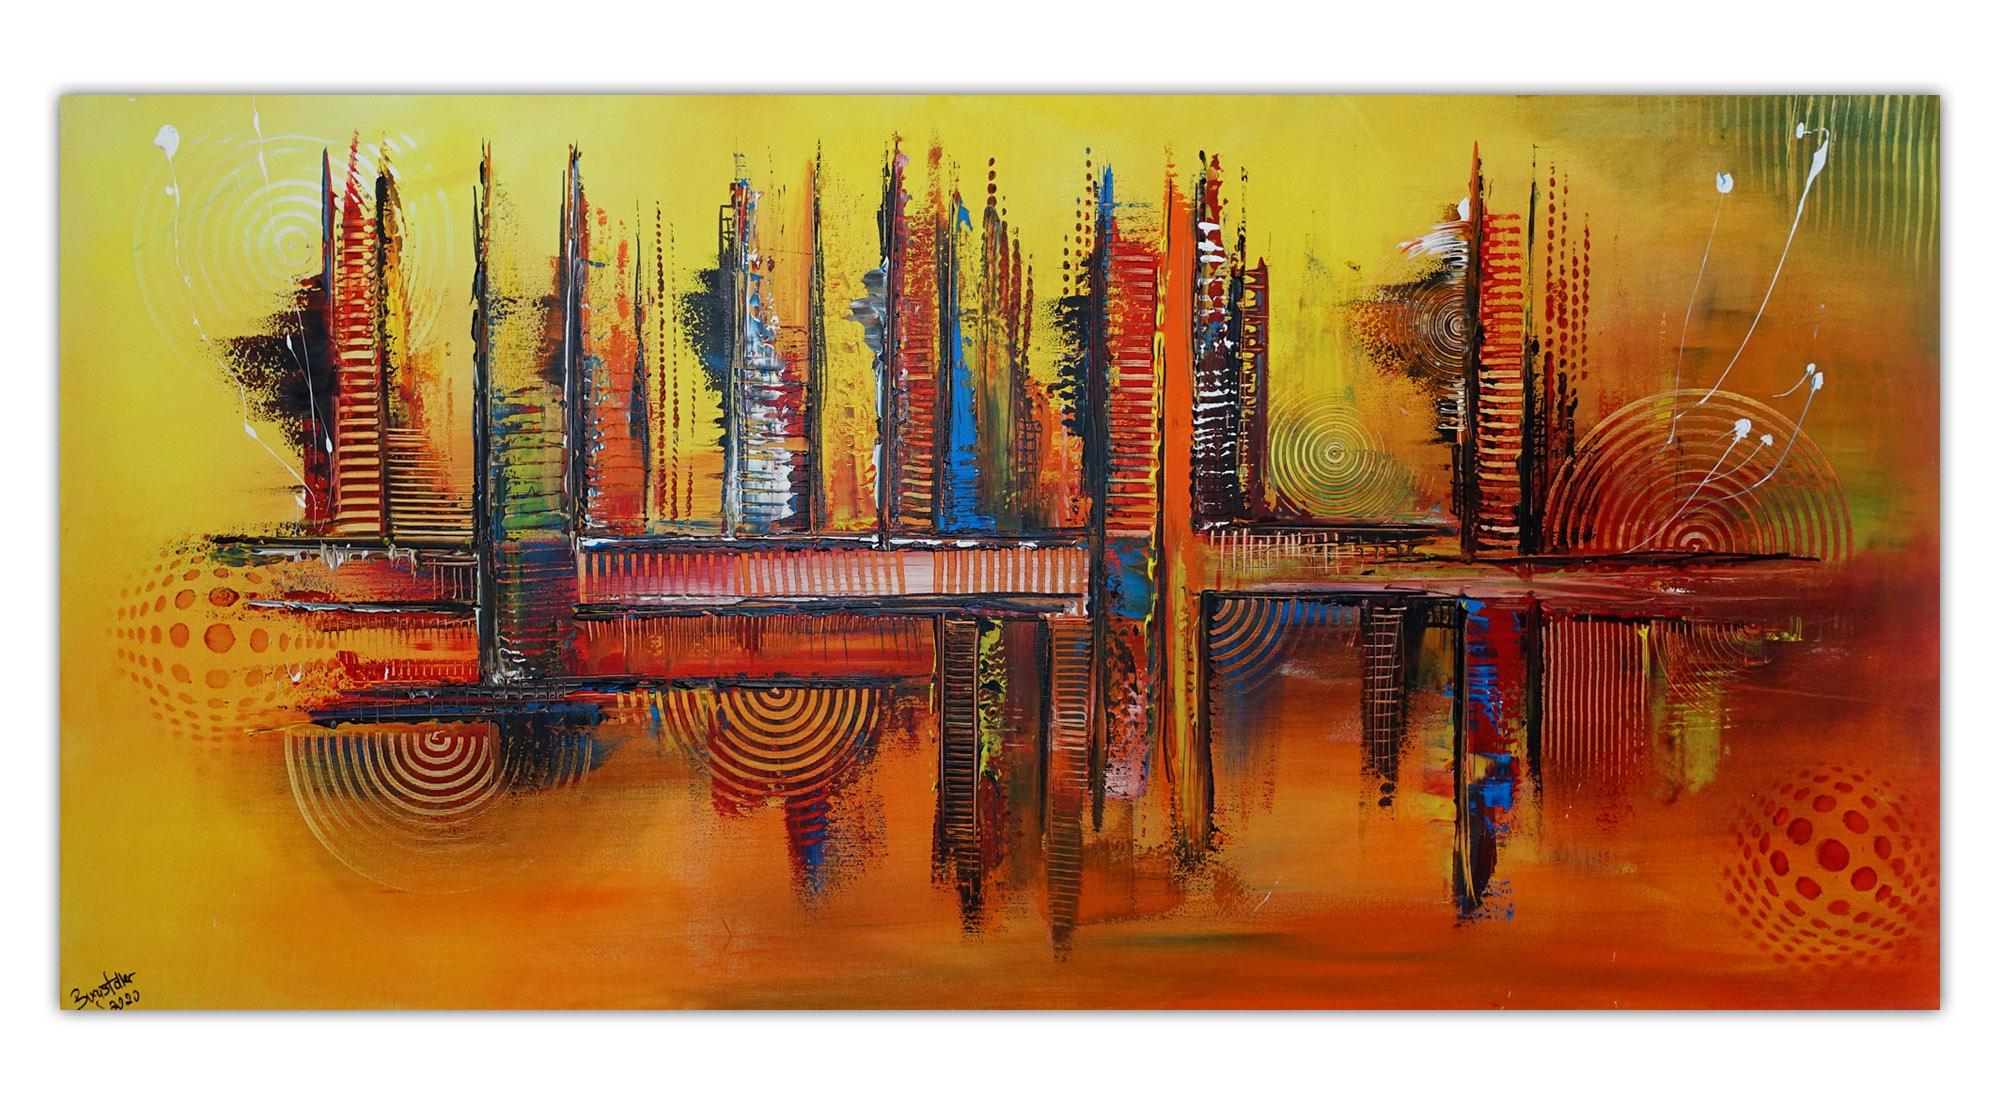 Passion abstraktes Gemaelde Malerei Leinwandbild Struktur rot gelb grau 80x140